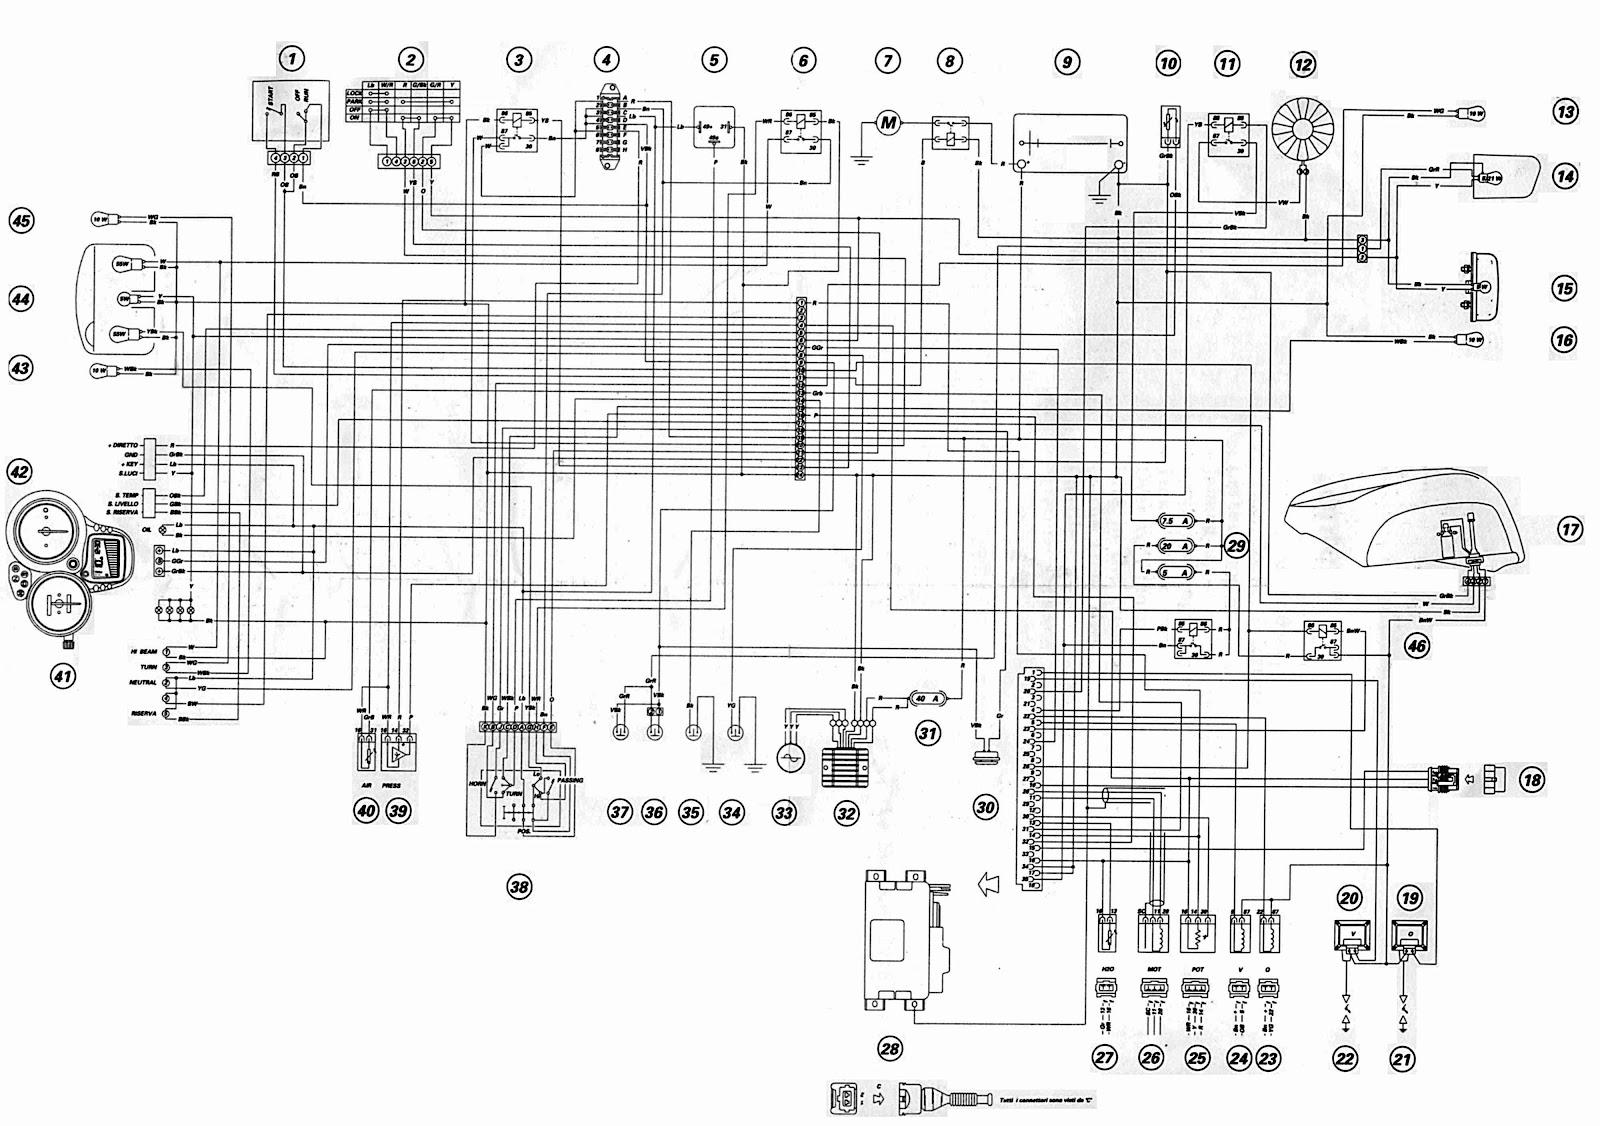 2004 Suzuki Drz 400 Wiring Diagram Trusted Schematics 06 Gsxr Wire Harness Color Code Drz400e Electrical Diagrams 2006 Mach Z